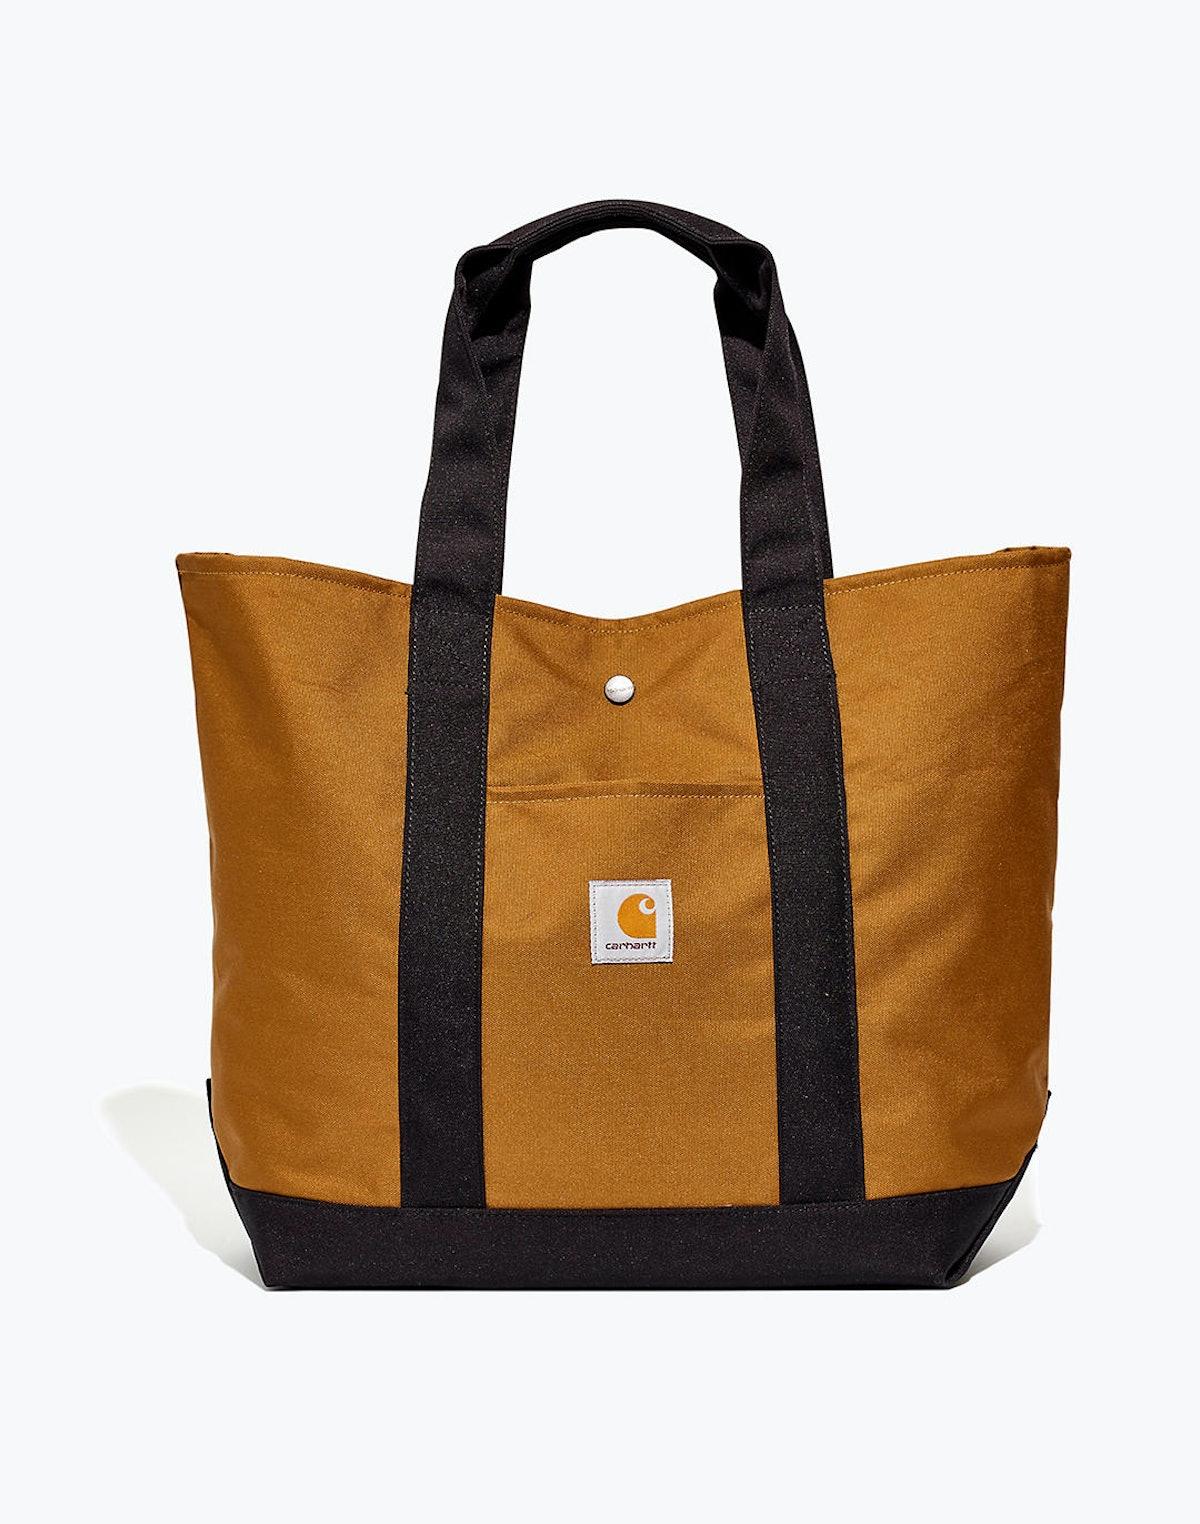 Carhartt® Work in Progress Simple Tote Bag